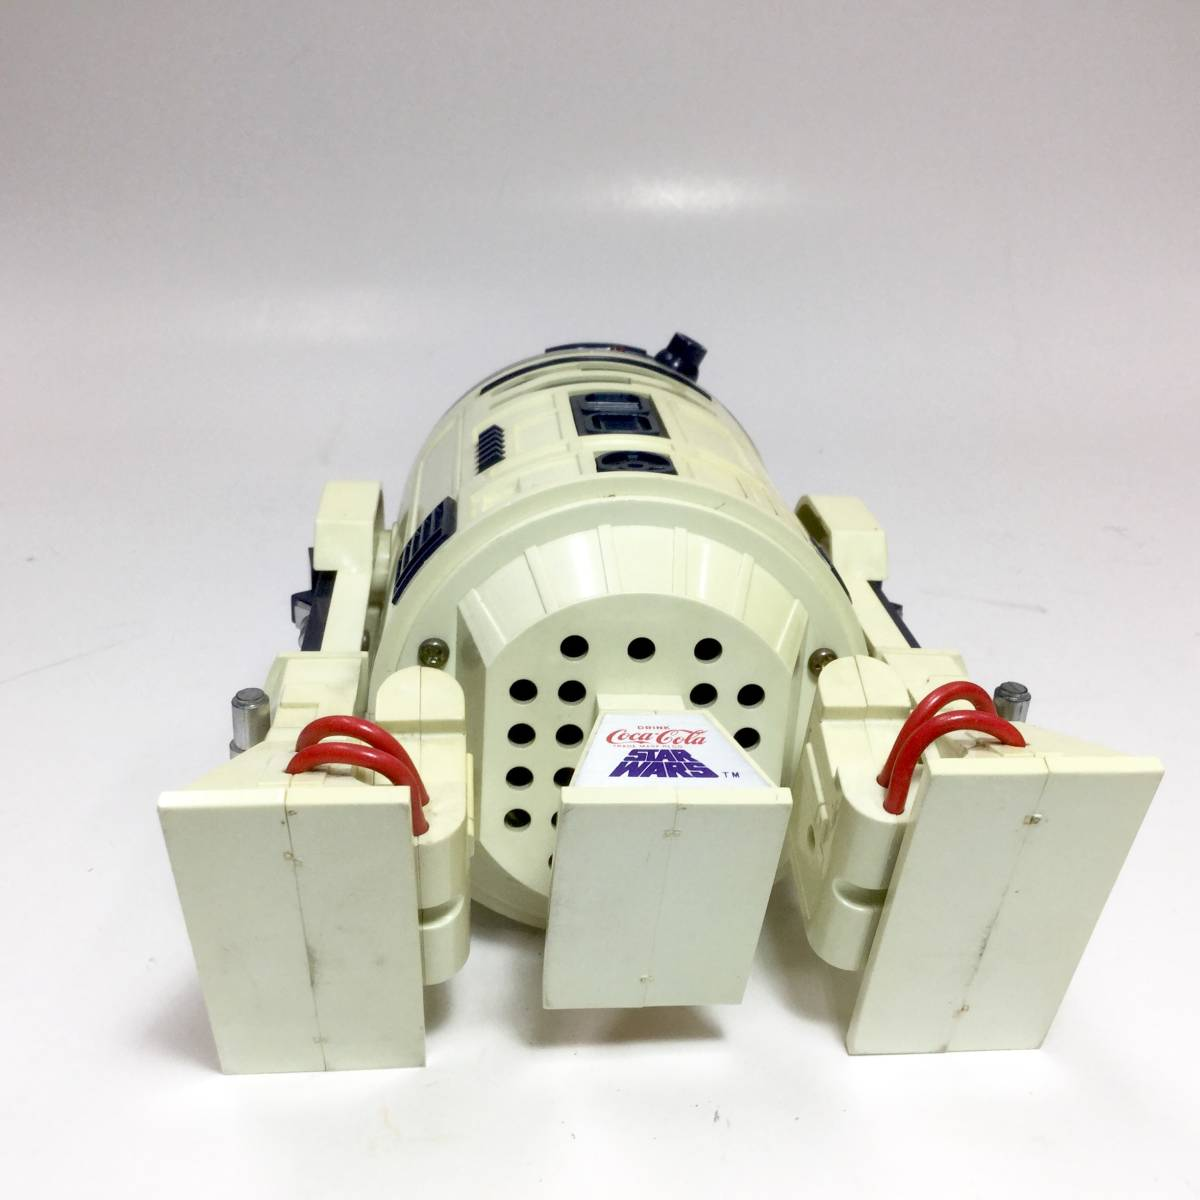 R2-D2 ラジオ 作動品 スターウォーズ 1977年版 コカコーラ 懸賞品 非売品 レトロ ビンテージ _画像10